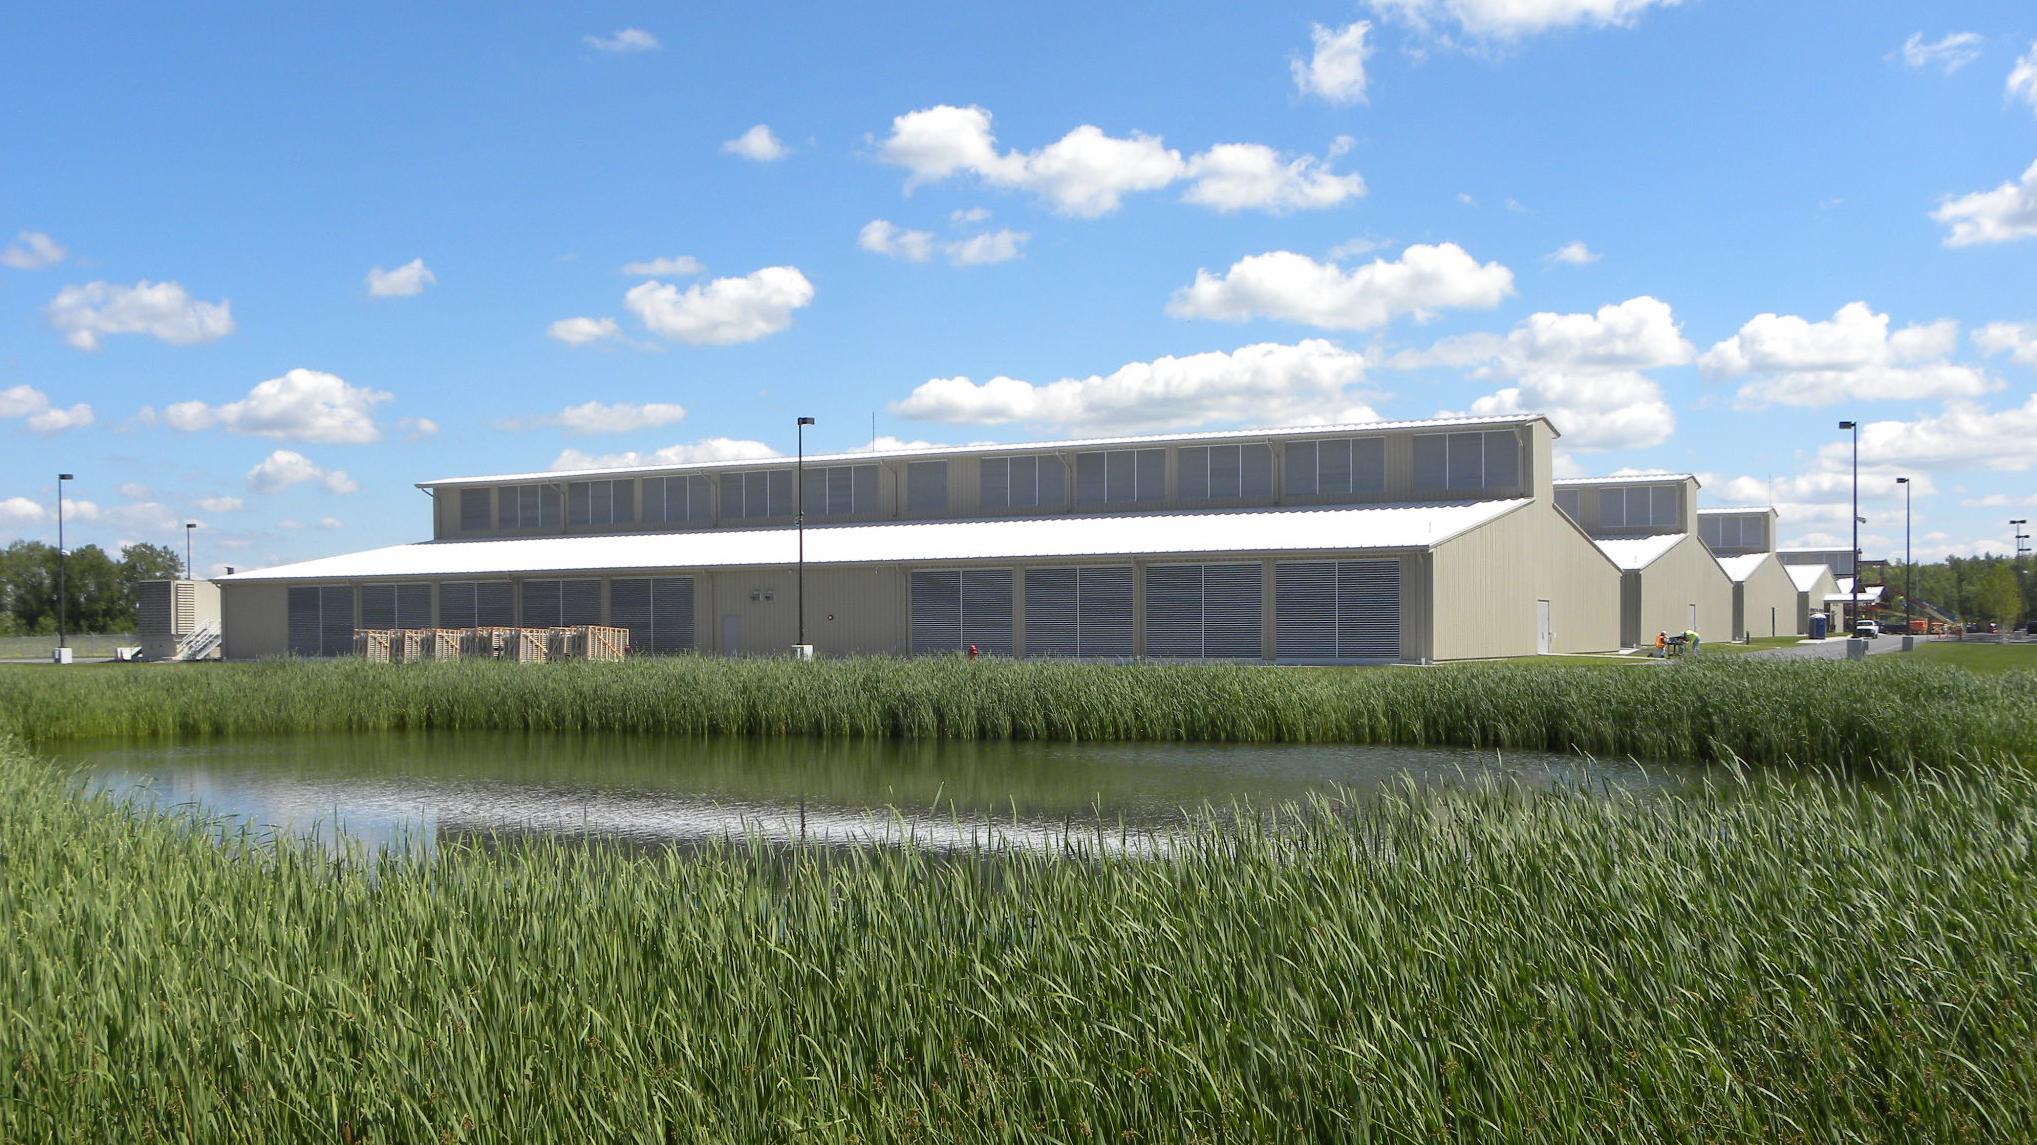 Yahoo data center in Lockport, New York